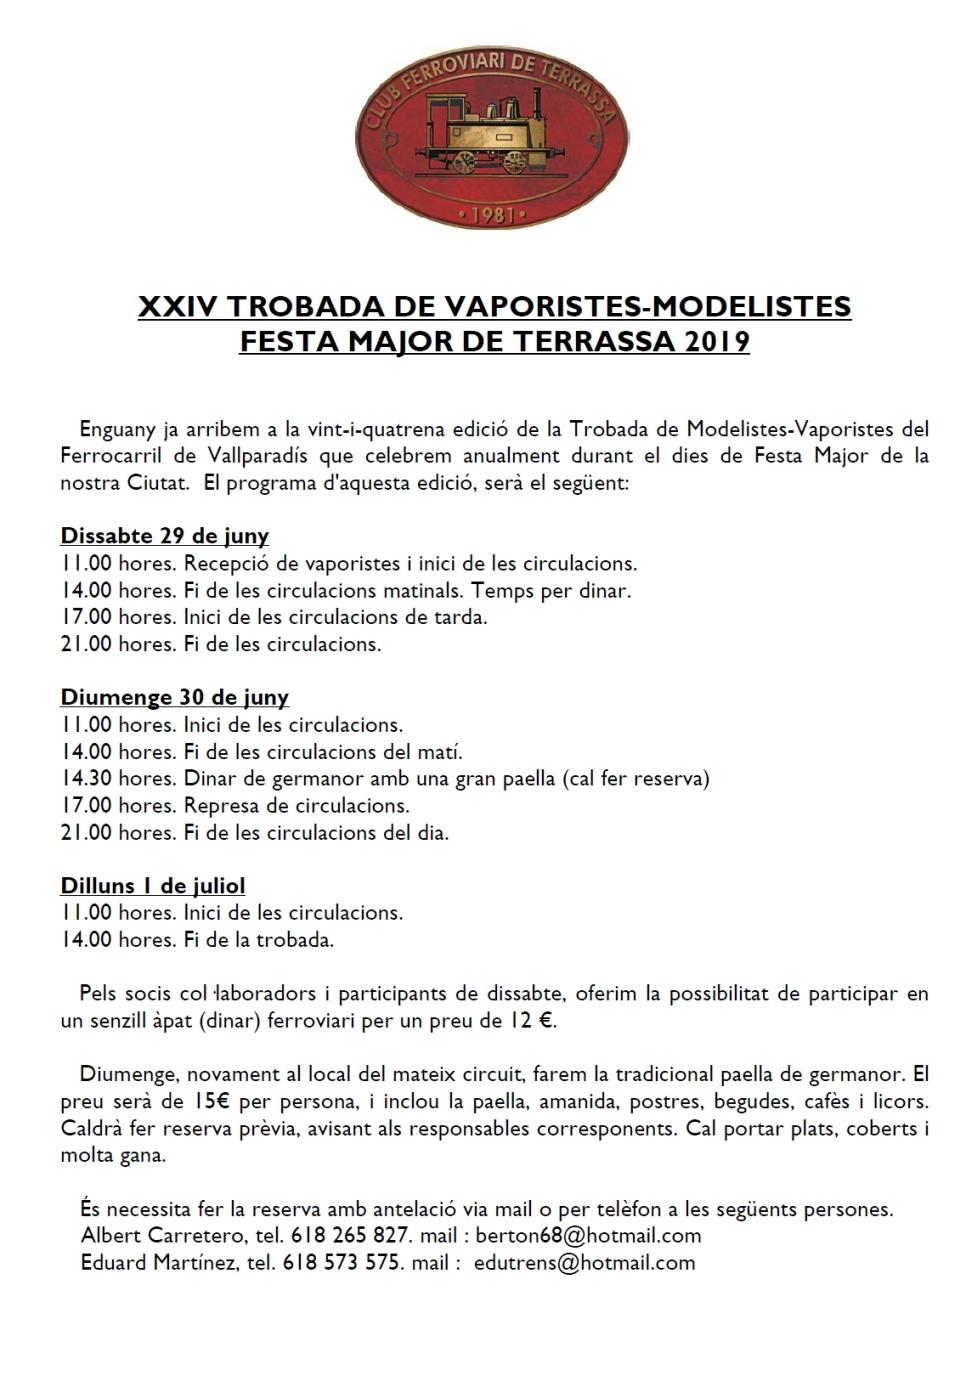 XXIV Troabada de Modelistes i Vaporistes. Festa Major de Terrassa 2019. Programa